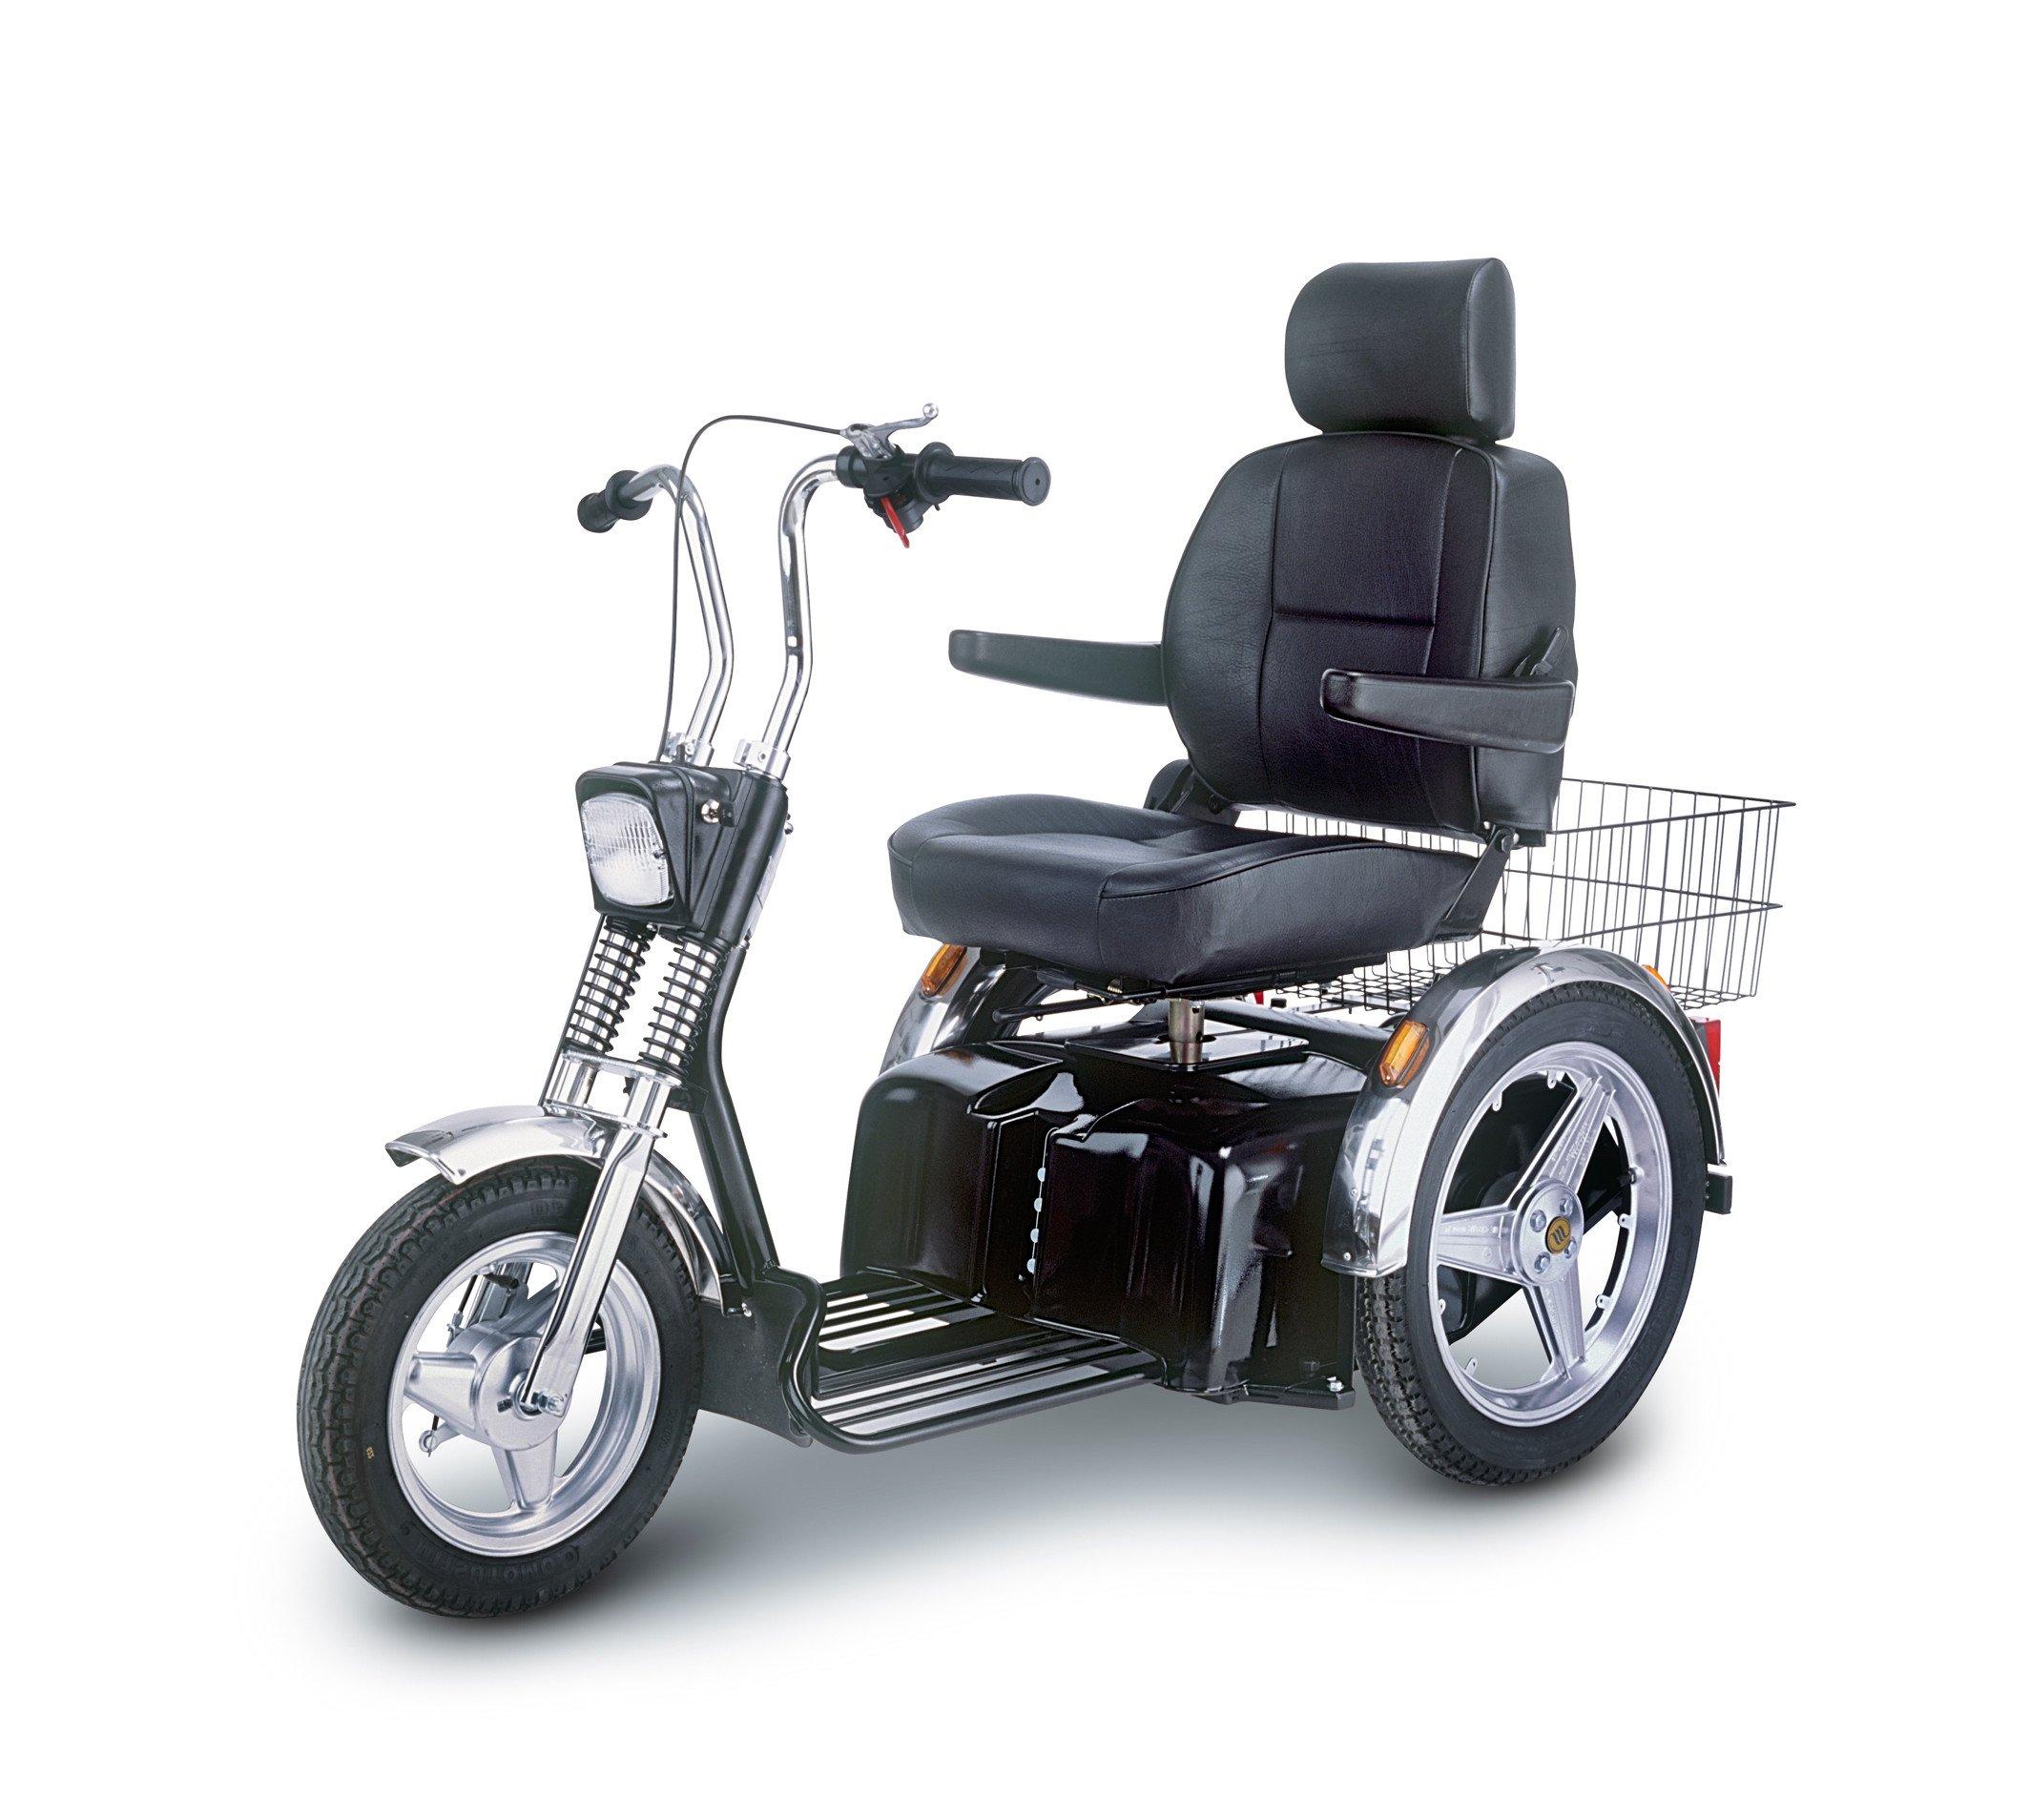 Afikim SE 3-Wheel Scooter